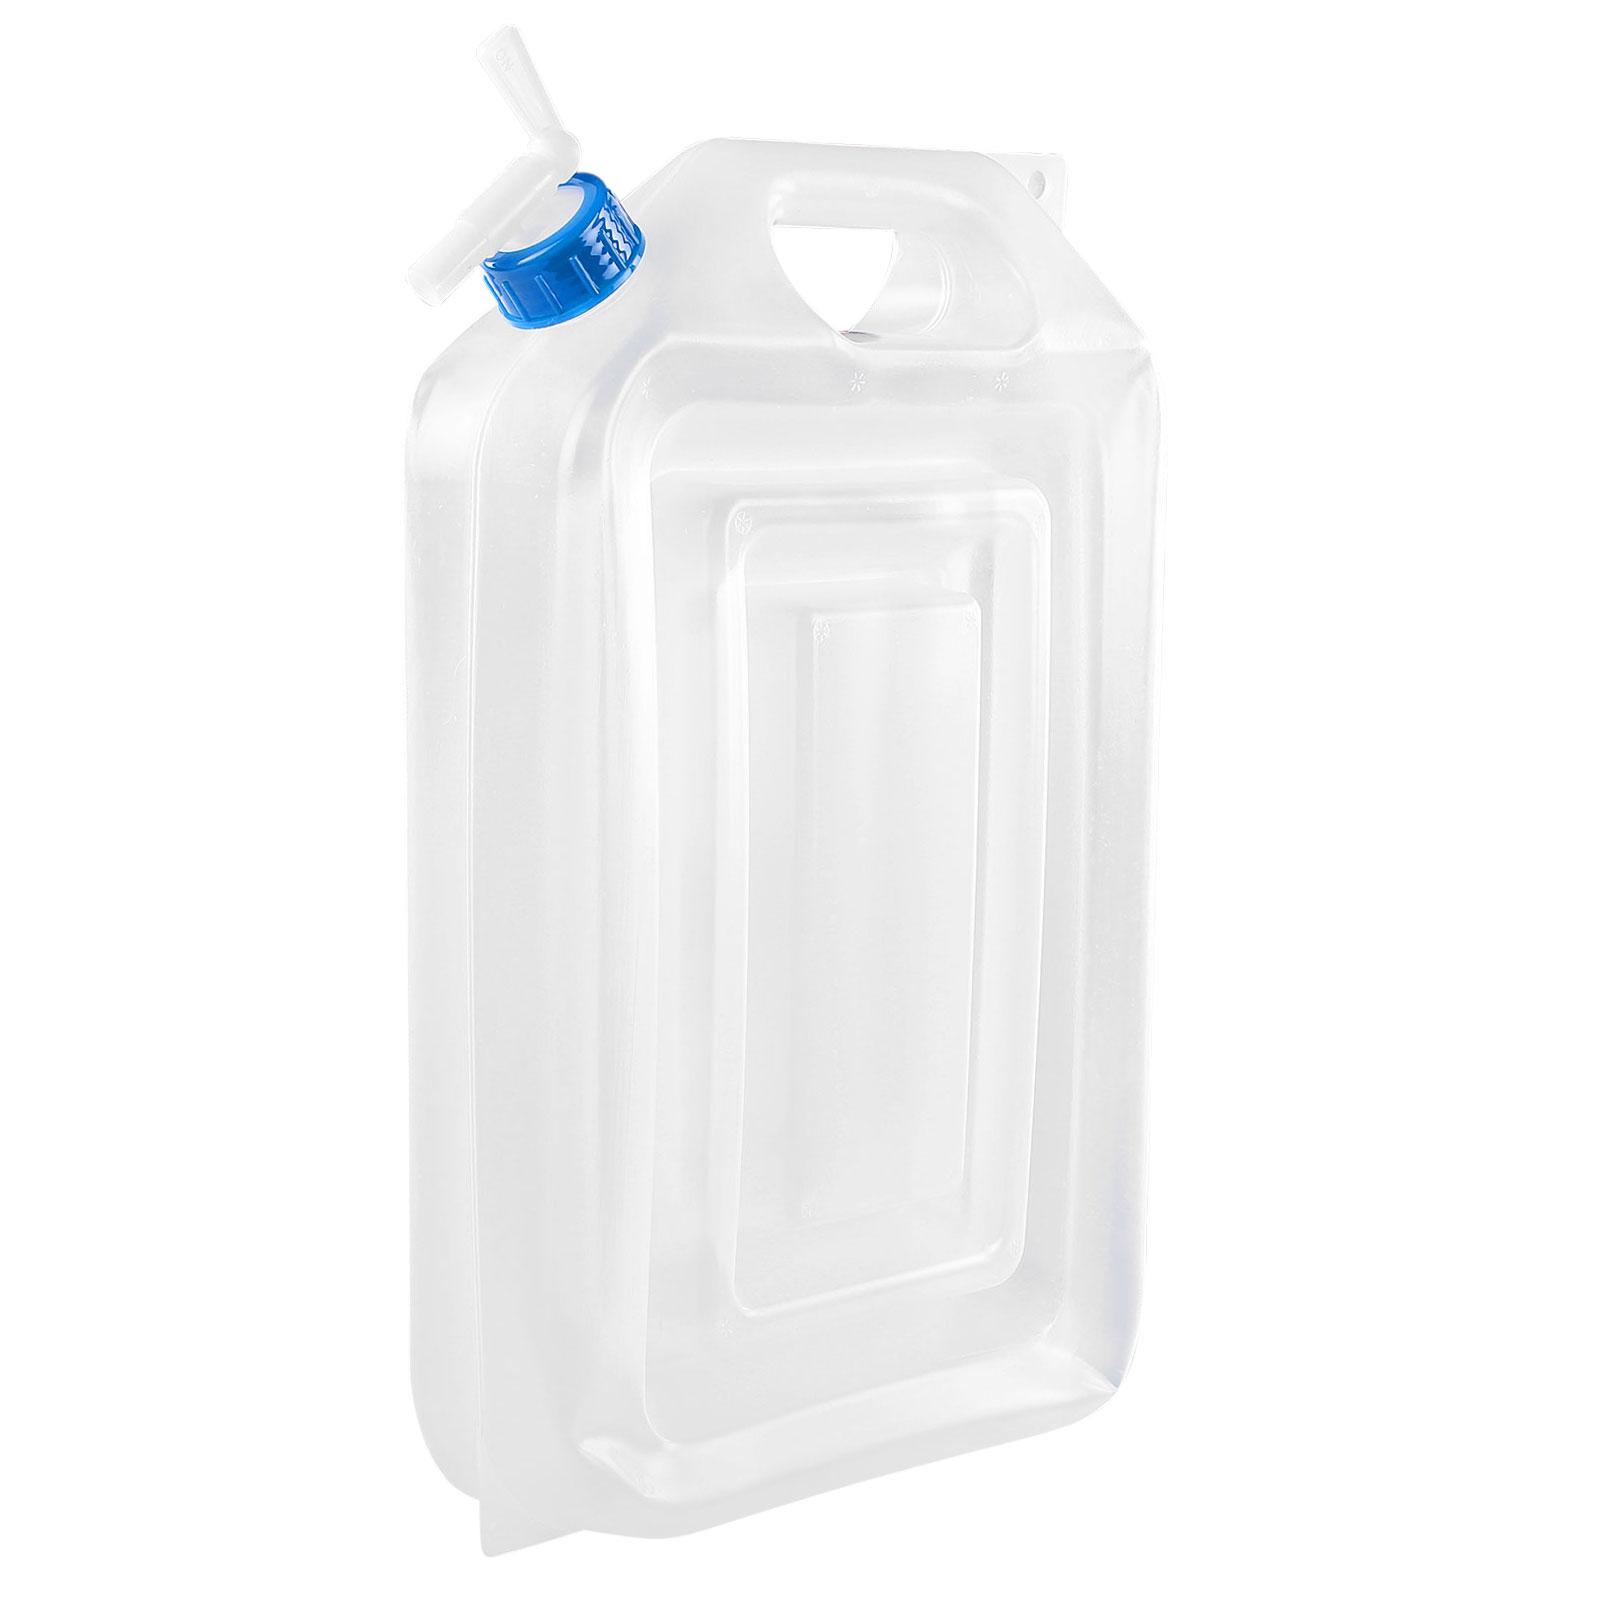 Kanister 16 Liter extra platzsparend